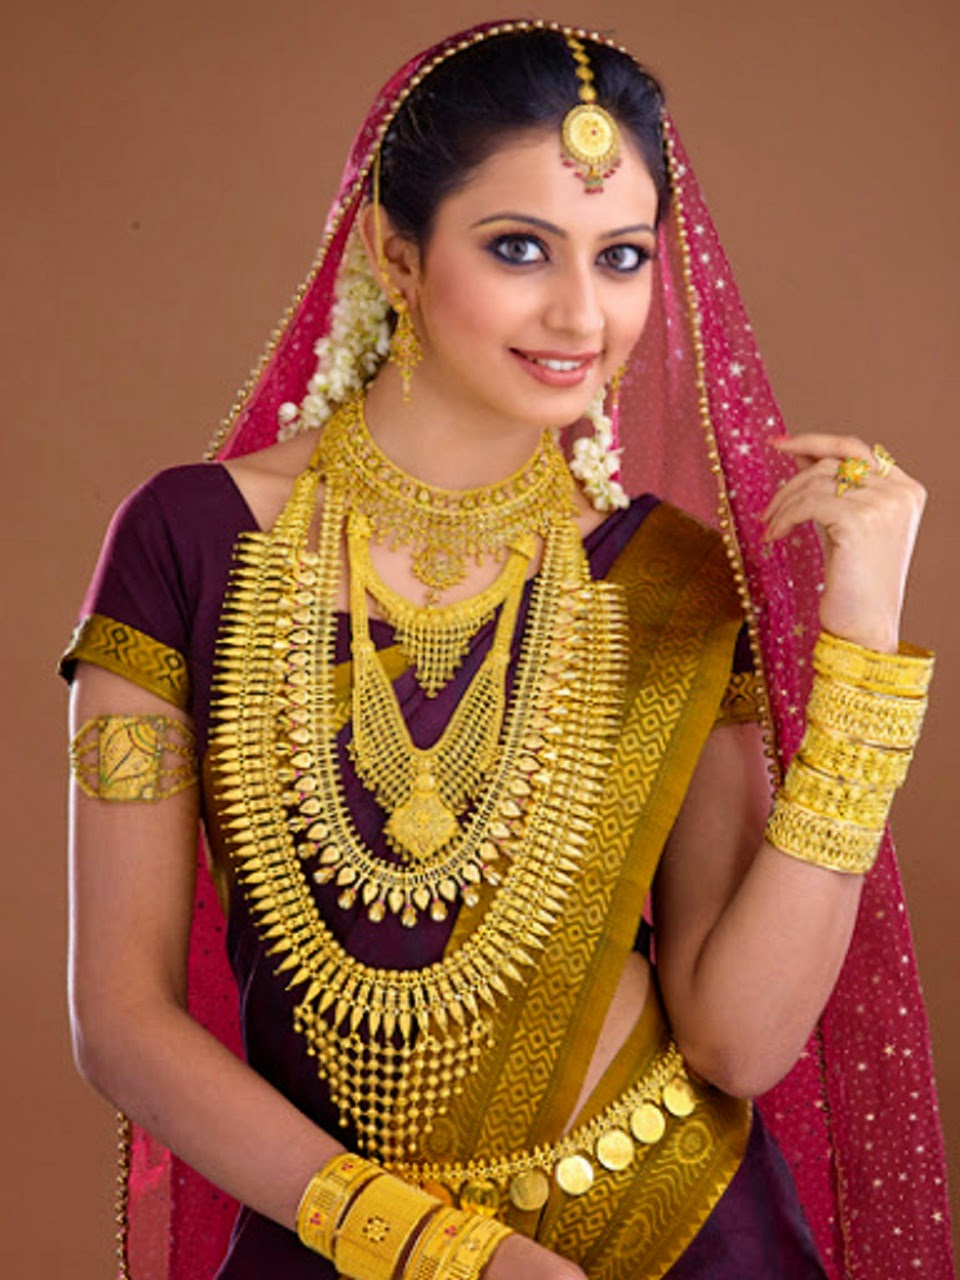 Very Beautiful Wedding Jewelry HD Wallpaper - all 4u wallpaper